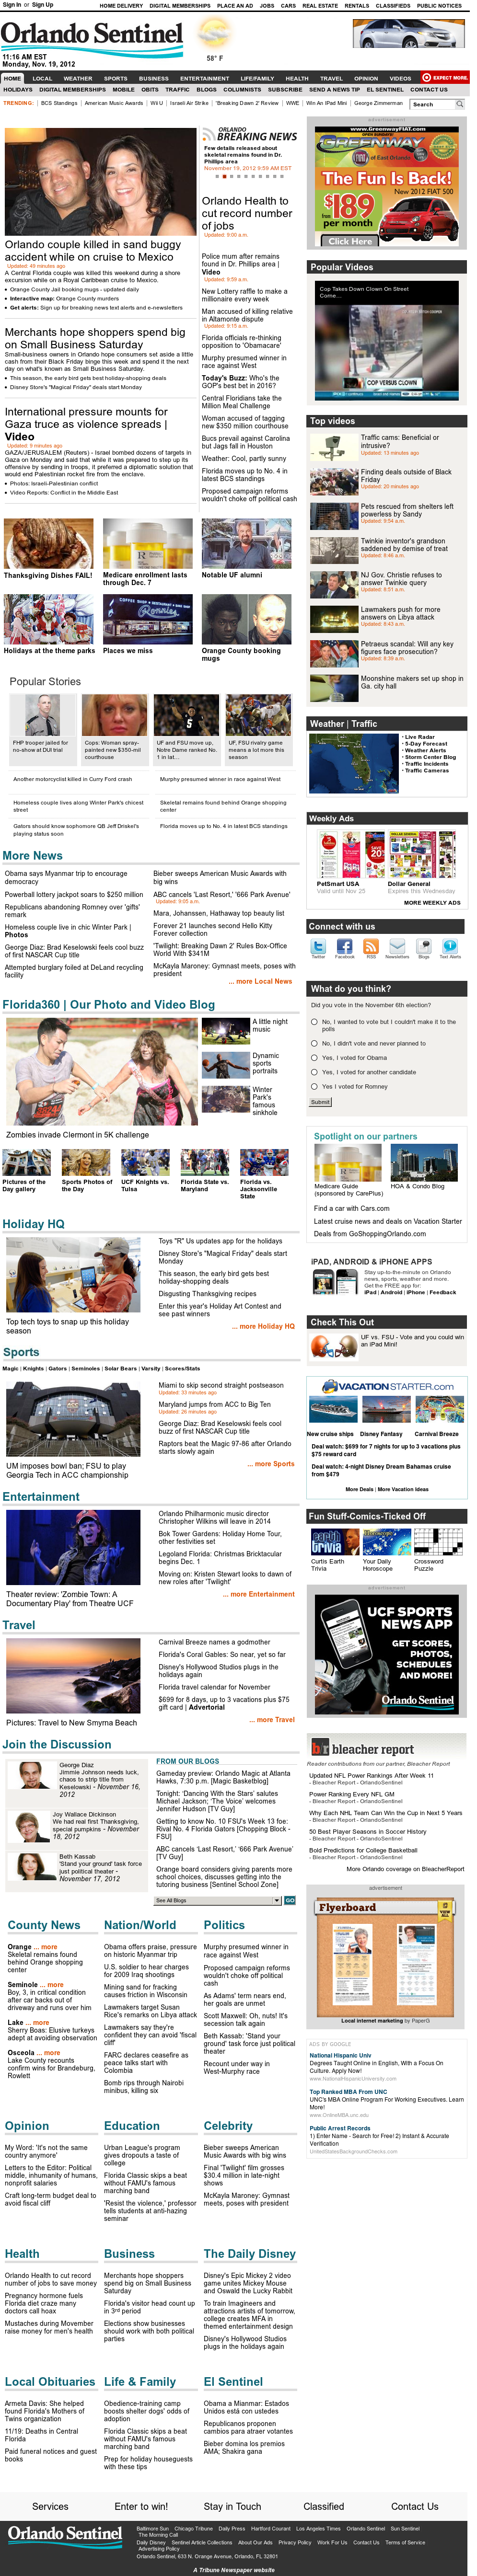 Orlando Sentinel at Monday Nov. 19, 2012, 4:23 p.m. UTC